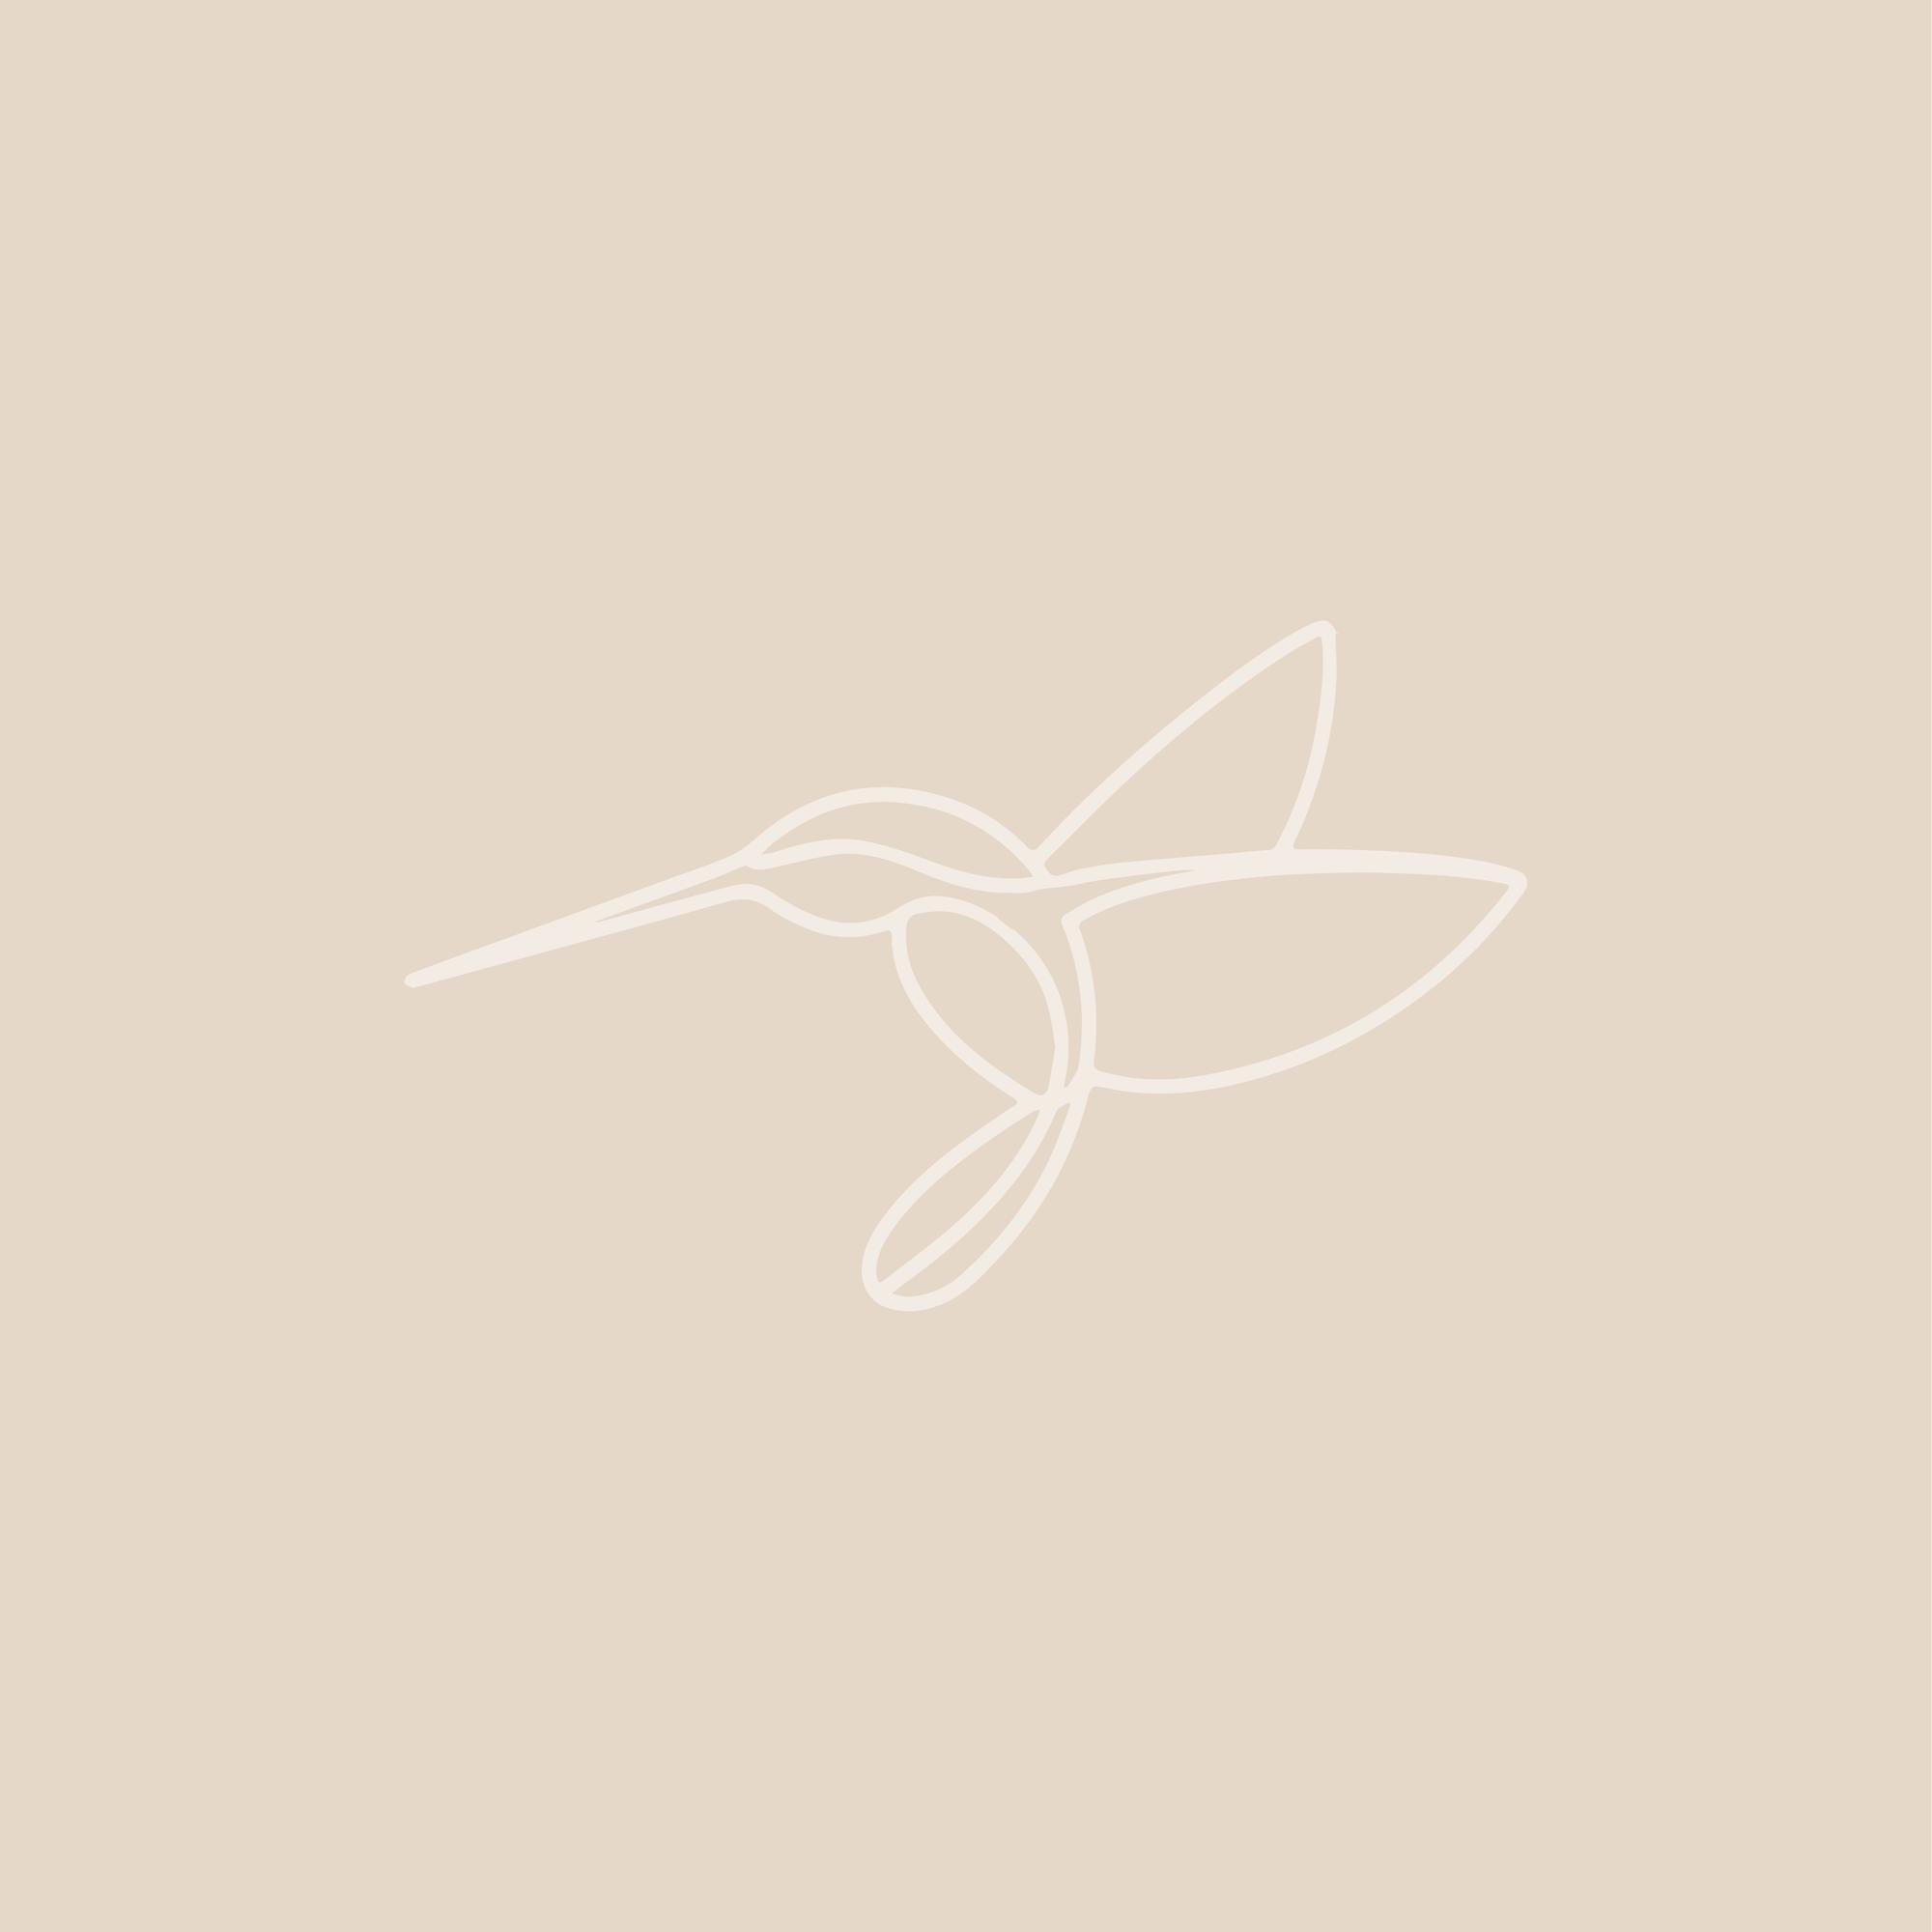 Hummingbird logo icon for personal brand by Amari Creative